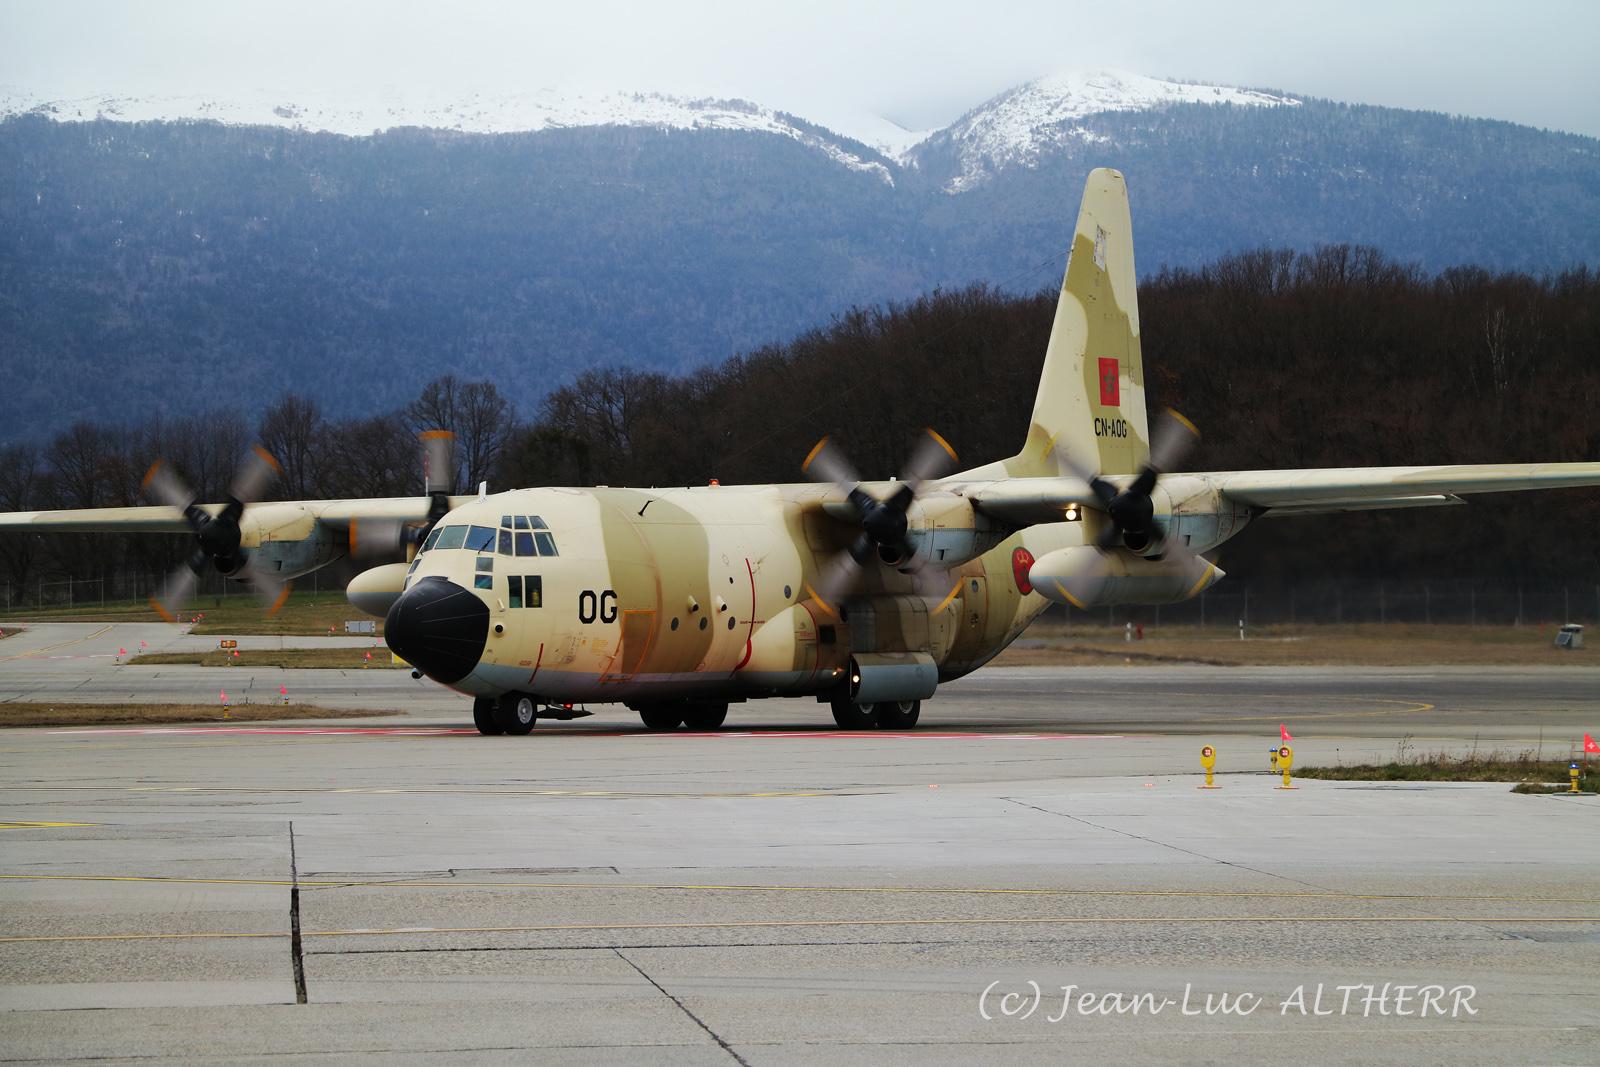 FRA: Photos d'avions de transport - Page 37 46594182814_03fbdb2217_o